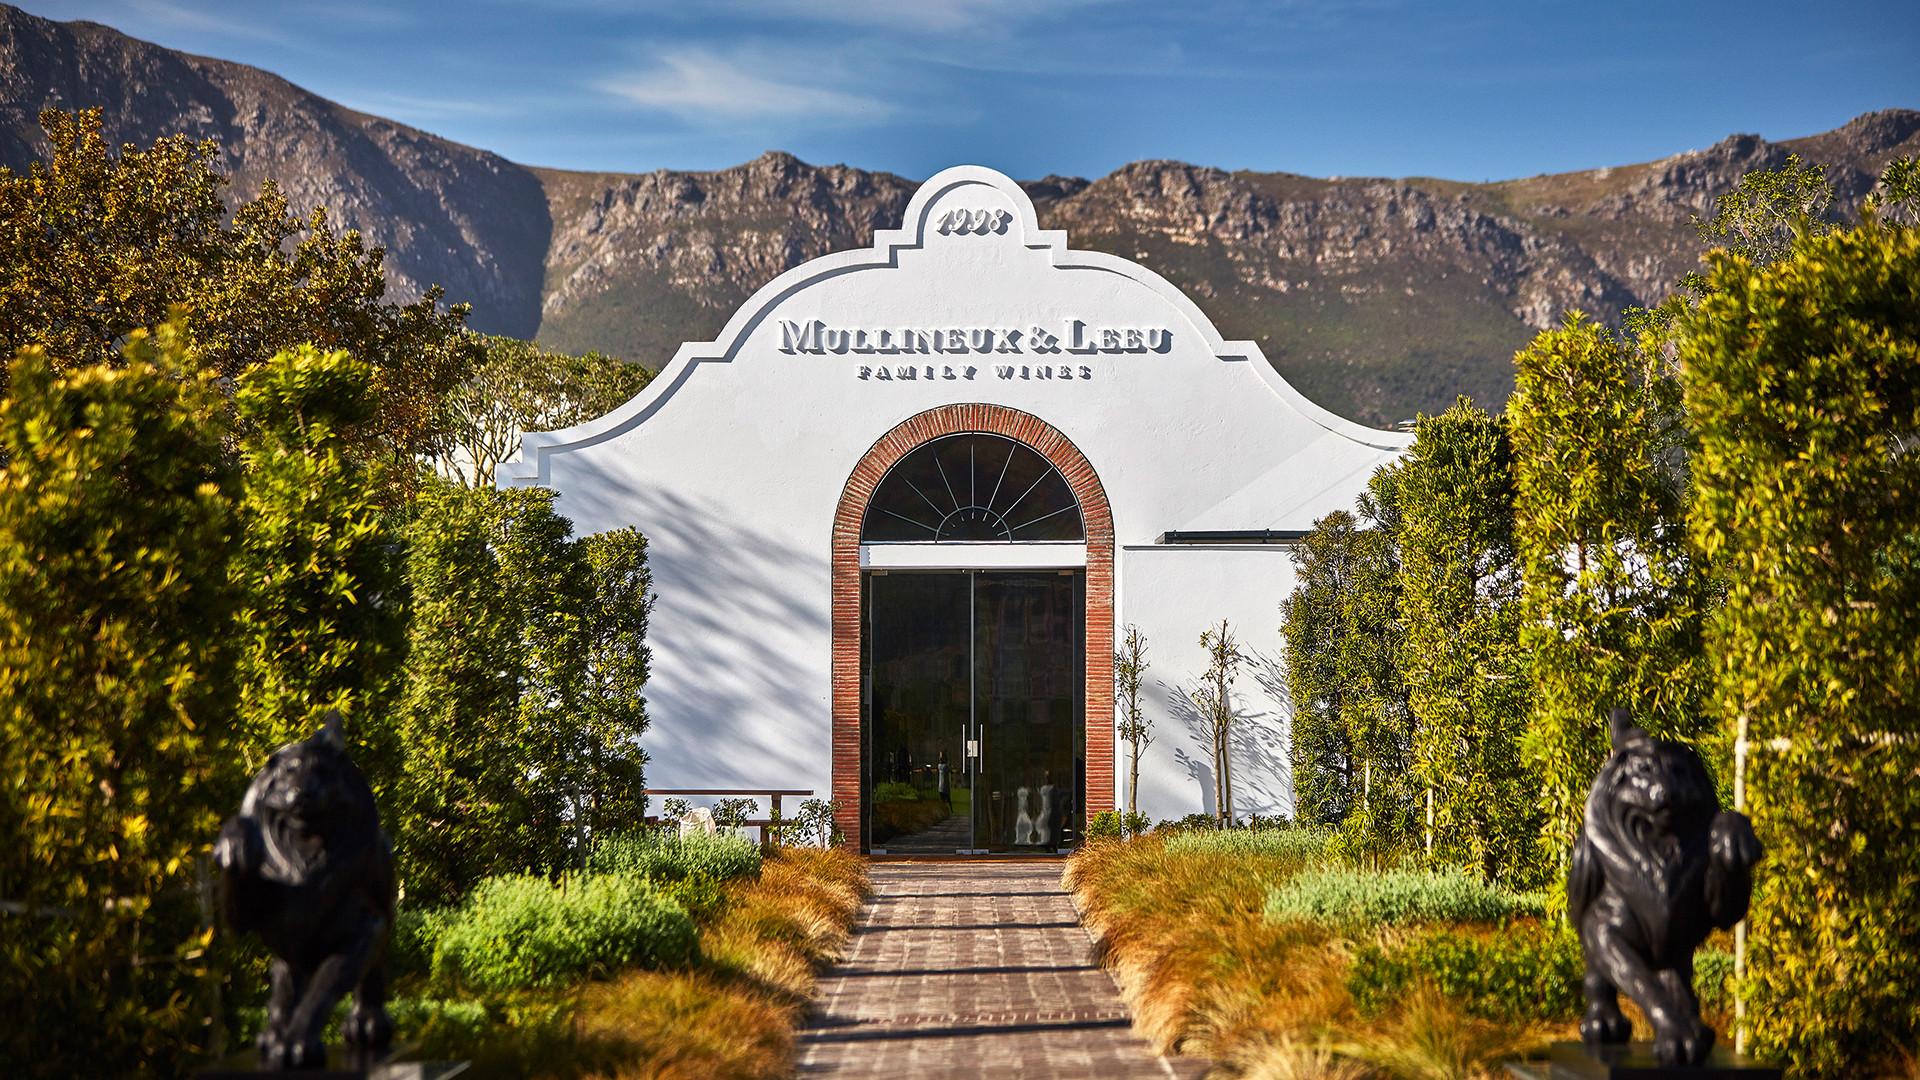 The Mullineux & Leeu Family Wines estate